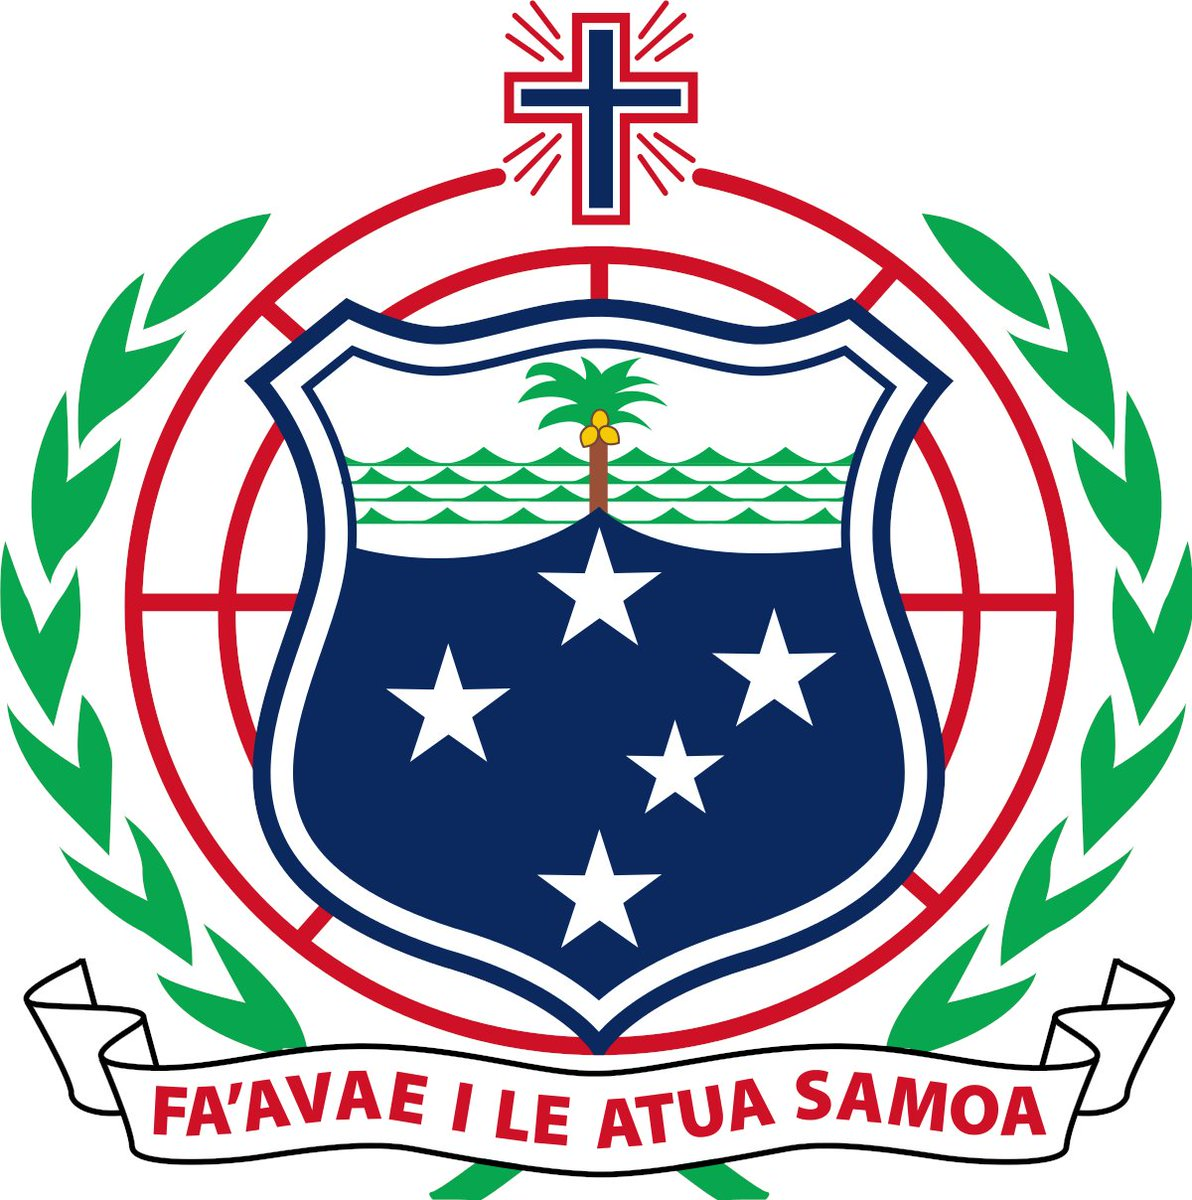 🔊🔊🔊 NEW   How best can #Custom and #Constitutions be balanced?  @AMDziedzic discusses #Samoa's experience and importance of public consultation  @Int_IDEA @leenarikkila @CherylSaunders1 @catsmandu @samoaobserver @CainTess @BalKama5 @SumitBisarya